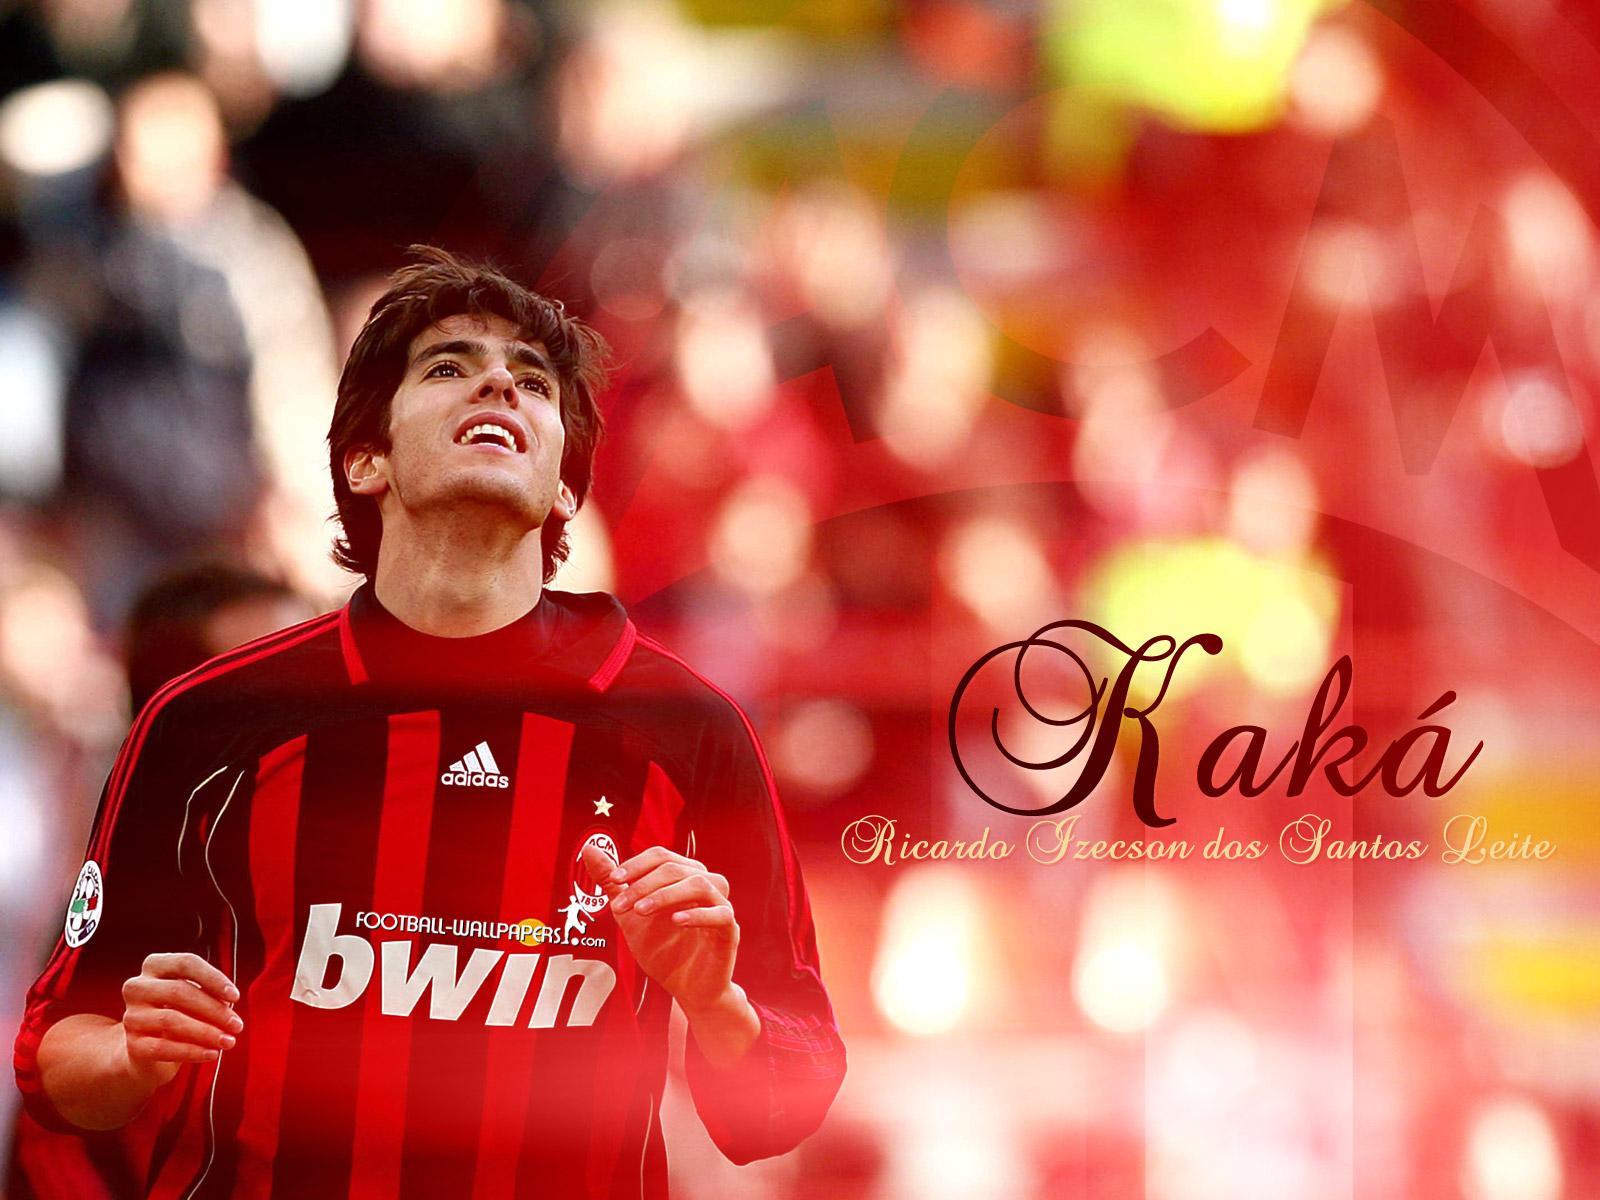 football lover kaka 1600x1200